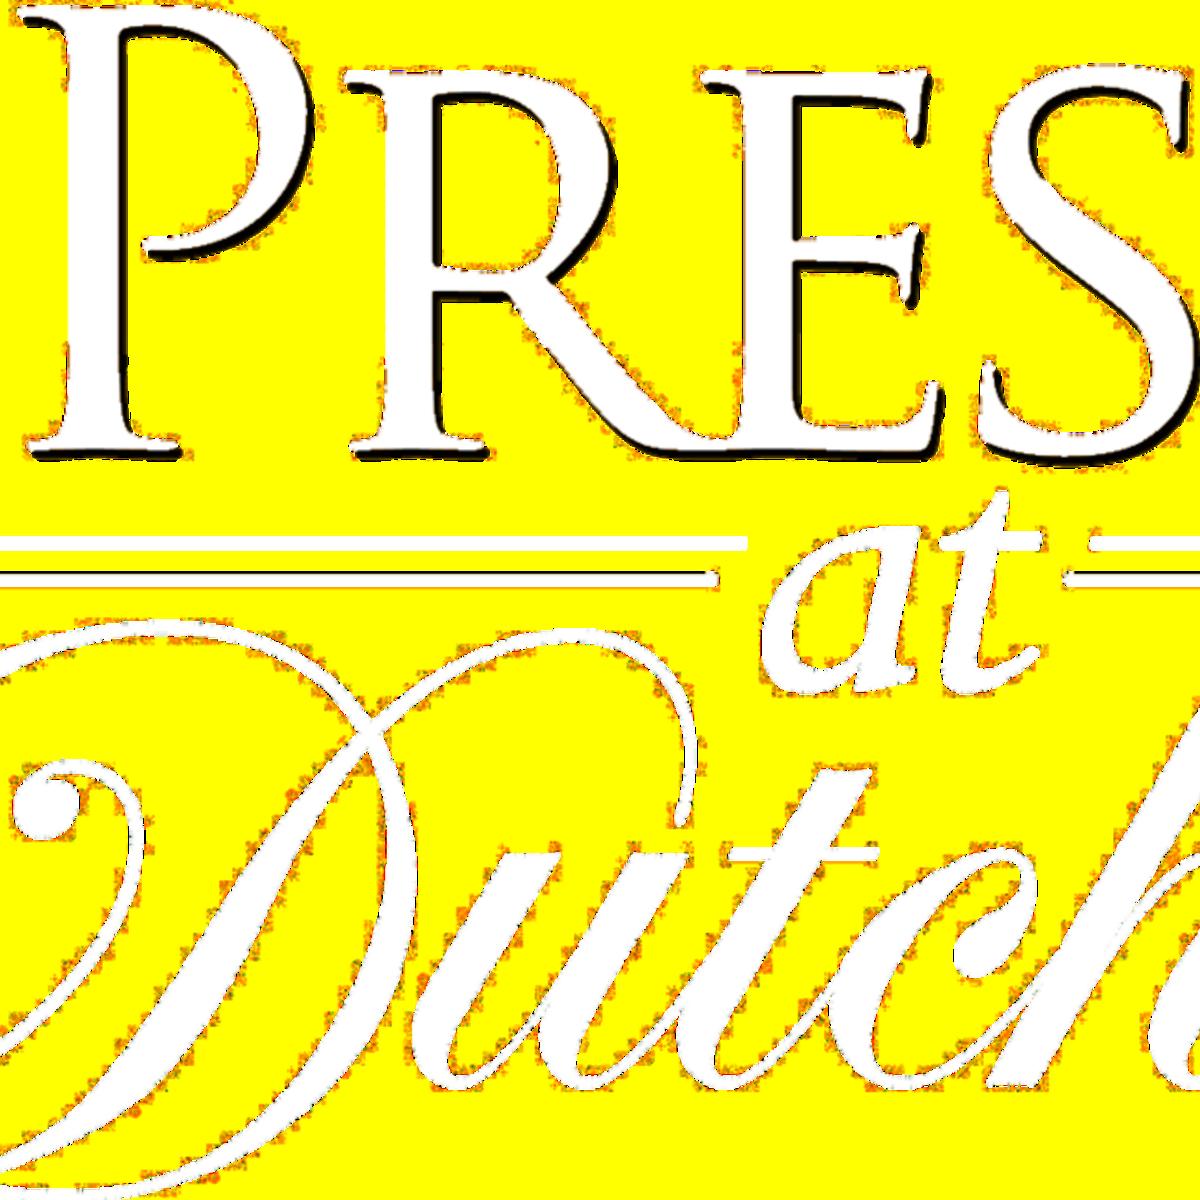 Rentnet Com: Contact Us The Preserve At Old Dutchtown